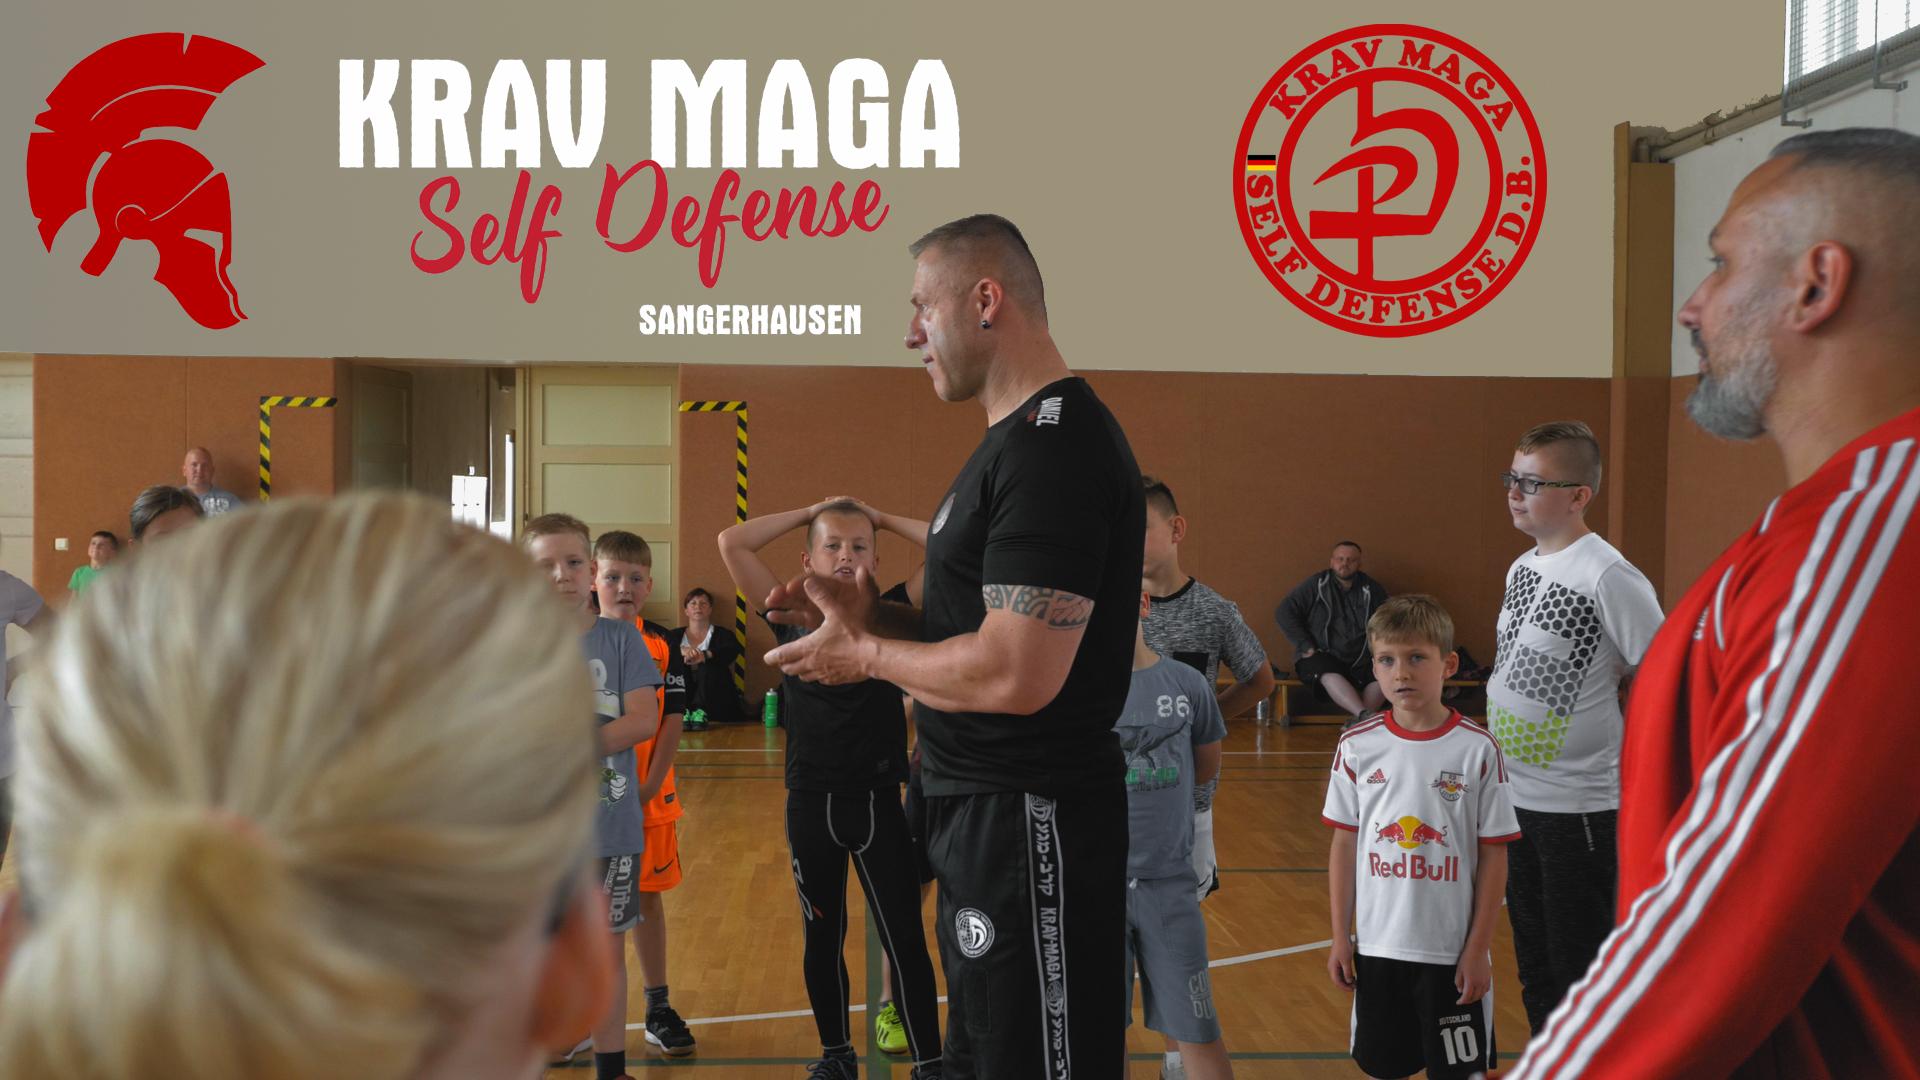 KRAV MAGA Self Defense - Sangerhausen - Imagevideo